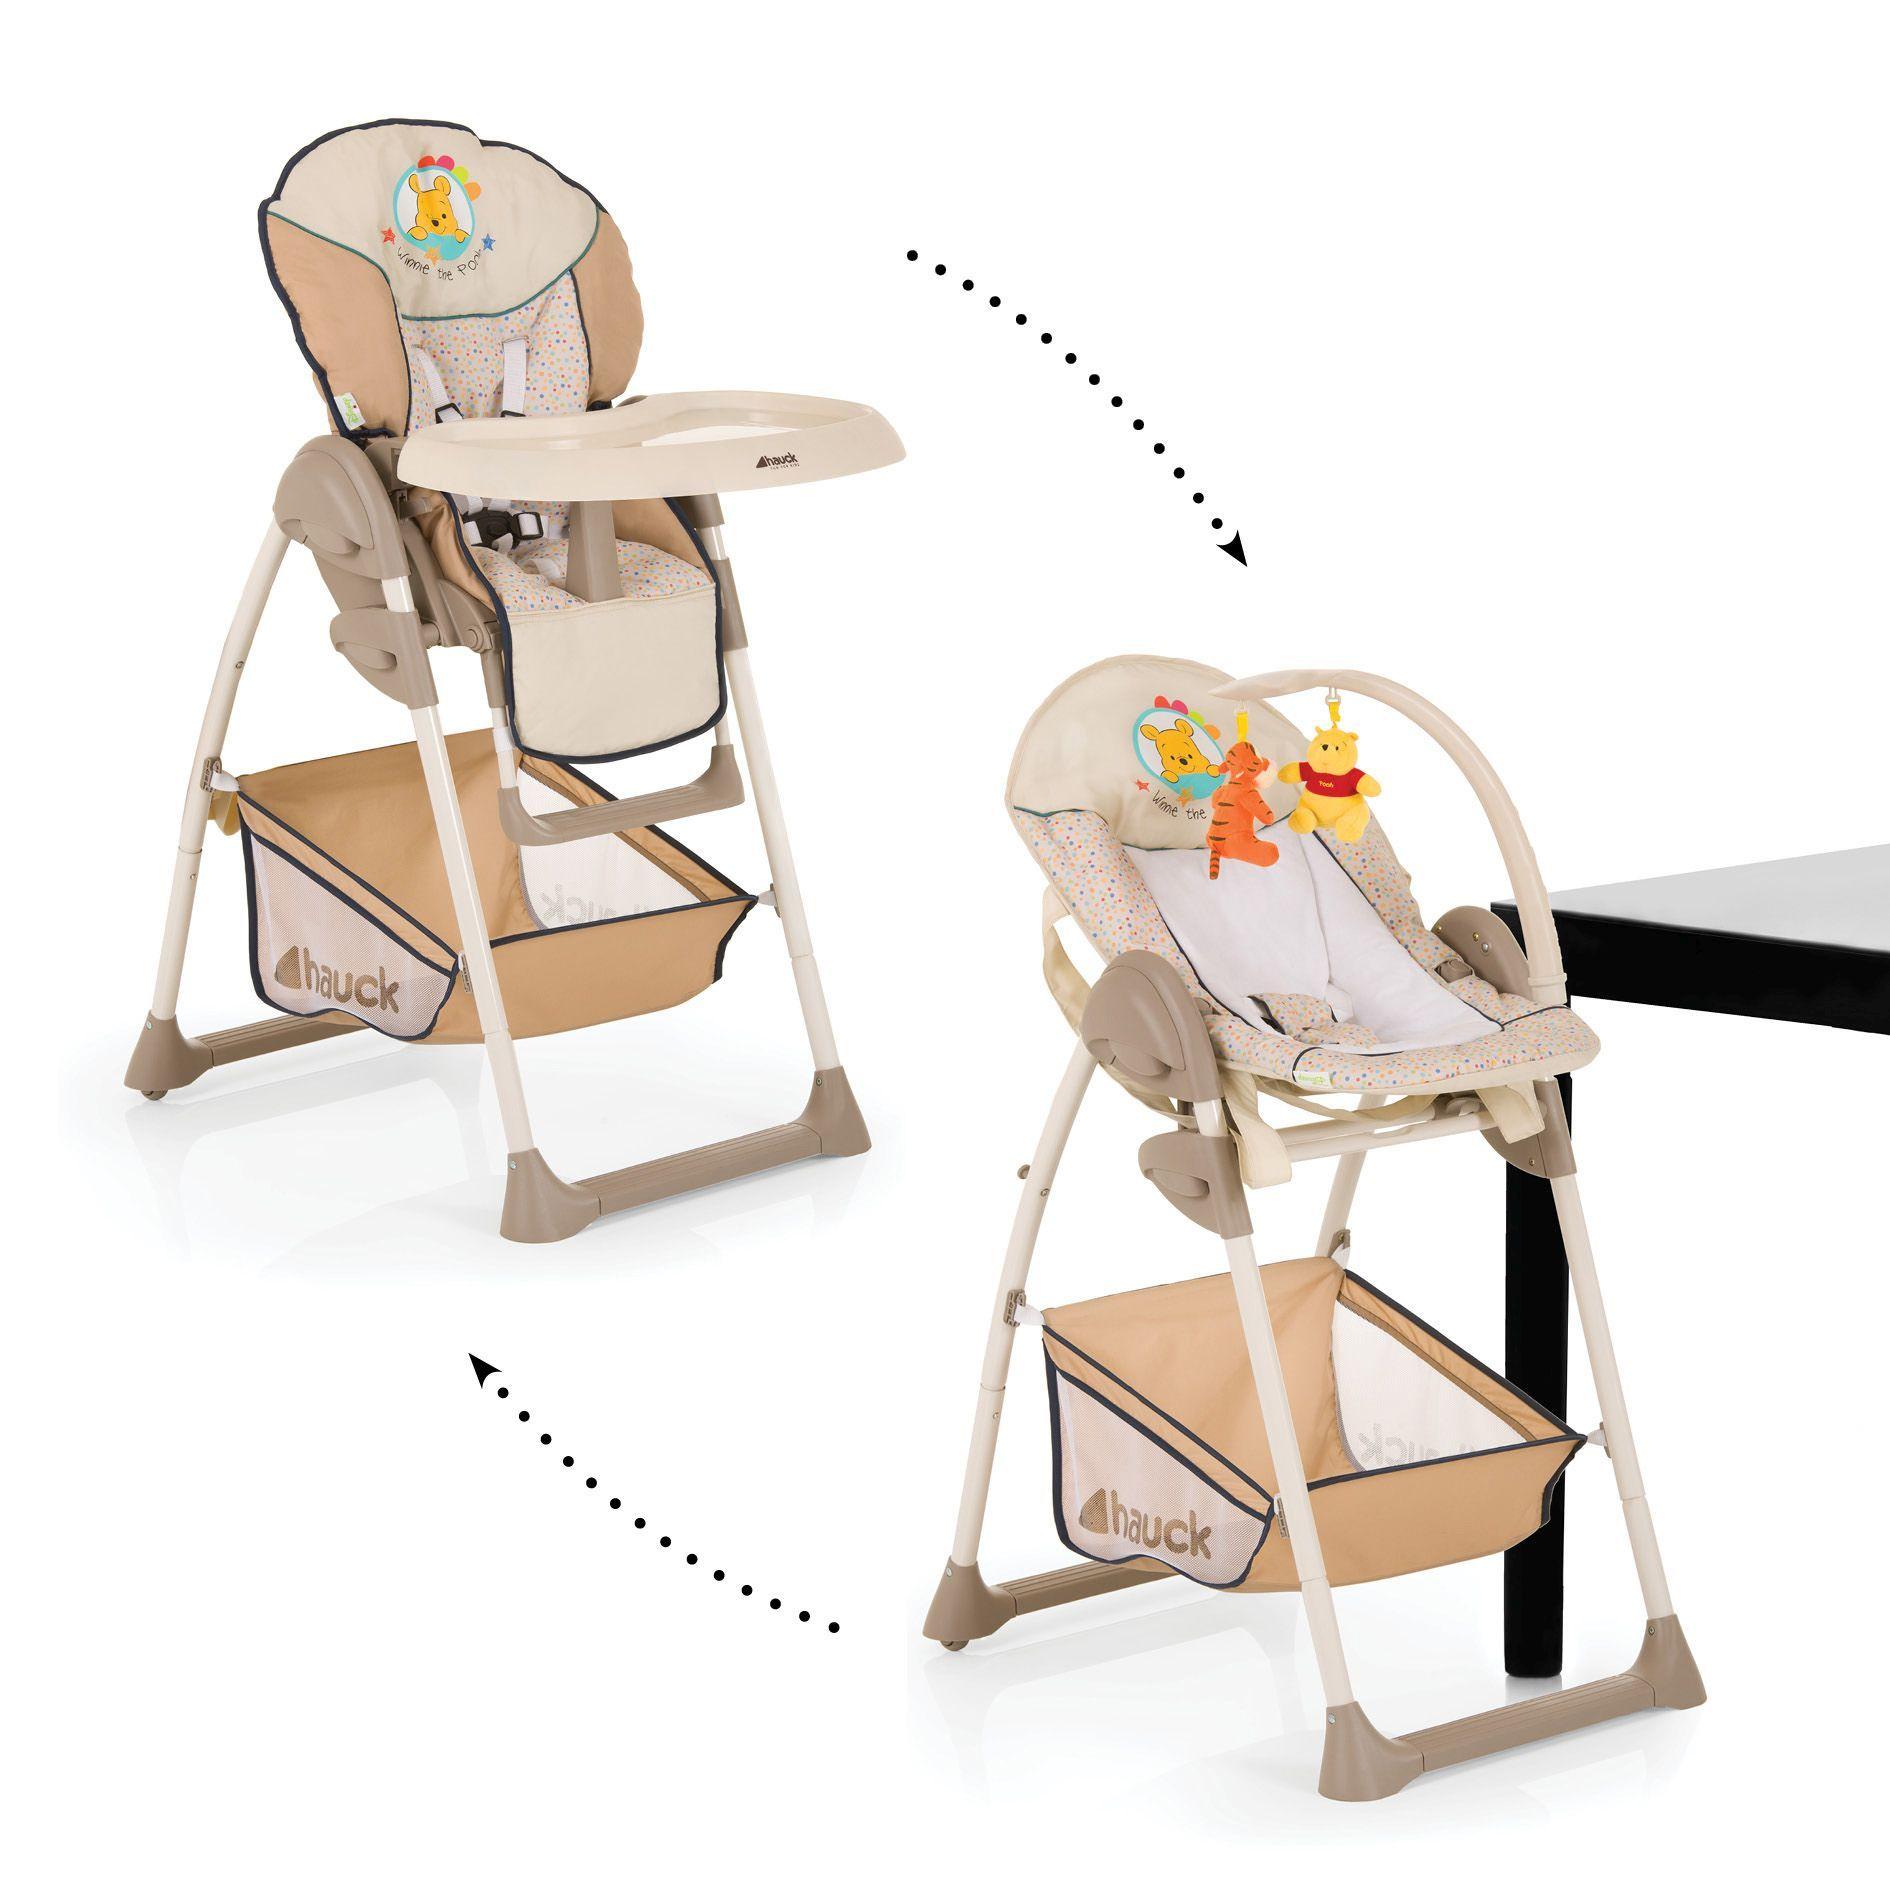 Hauck chaise haute sit 39 n relax winnie l 39 ourson 2018 acheter sur kidsroom alimentation - Chaise haute hauck winnie ...